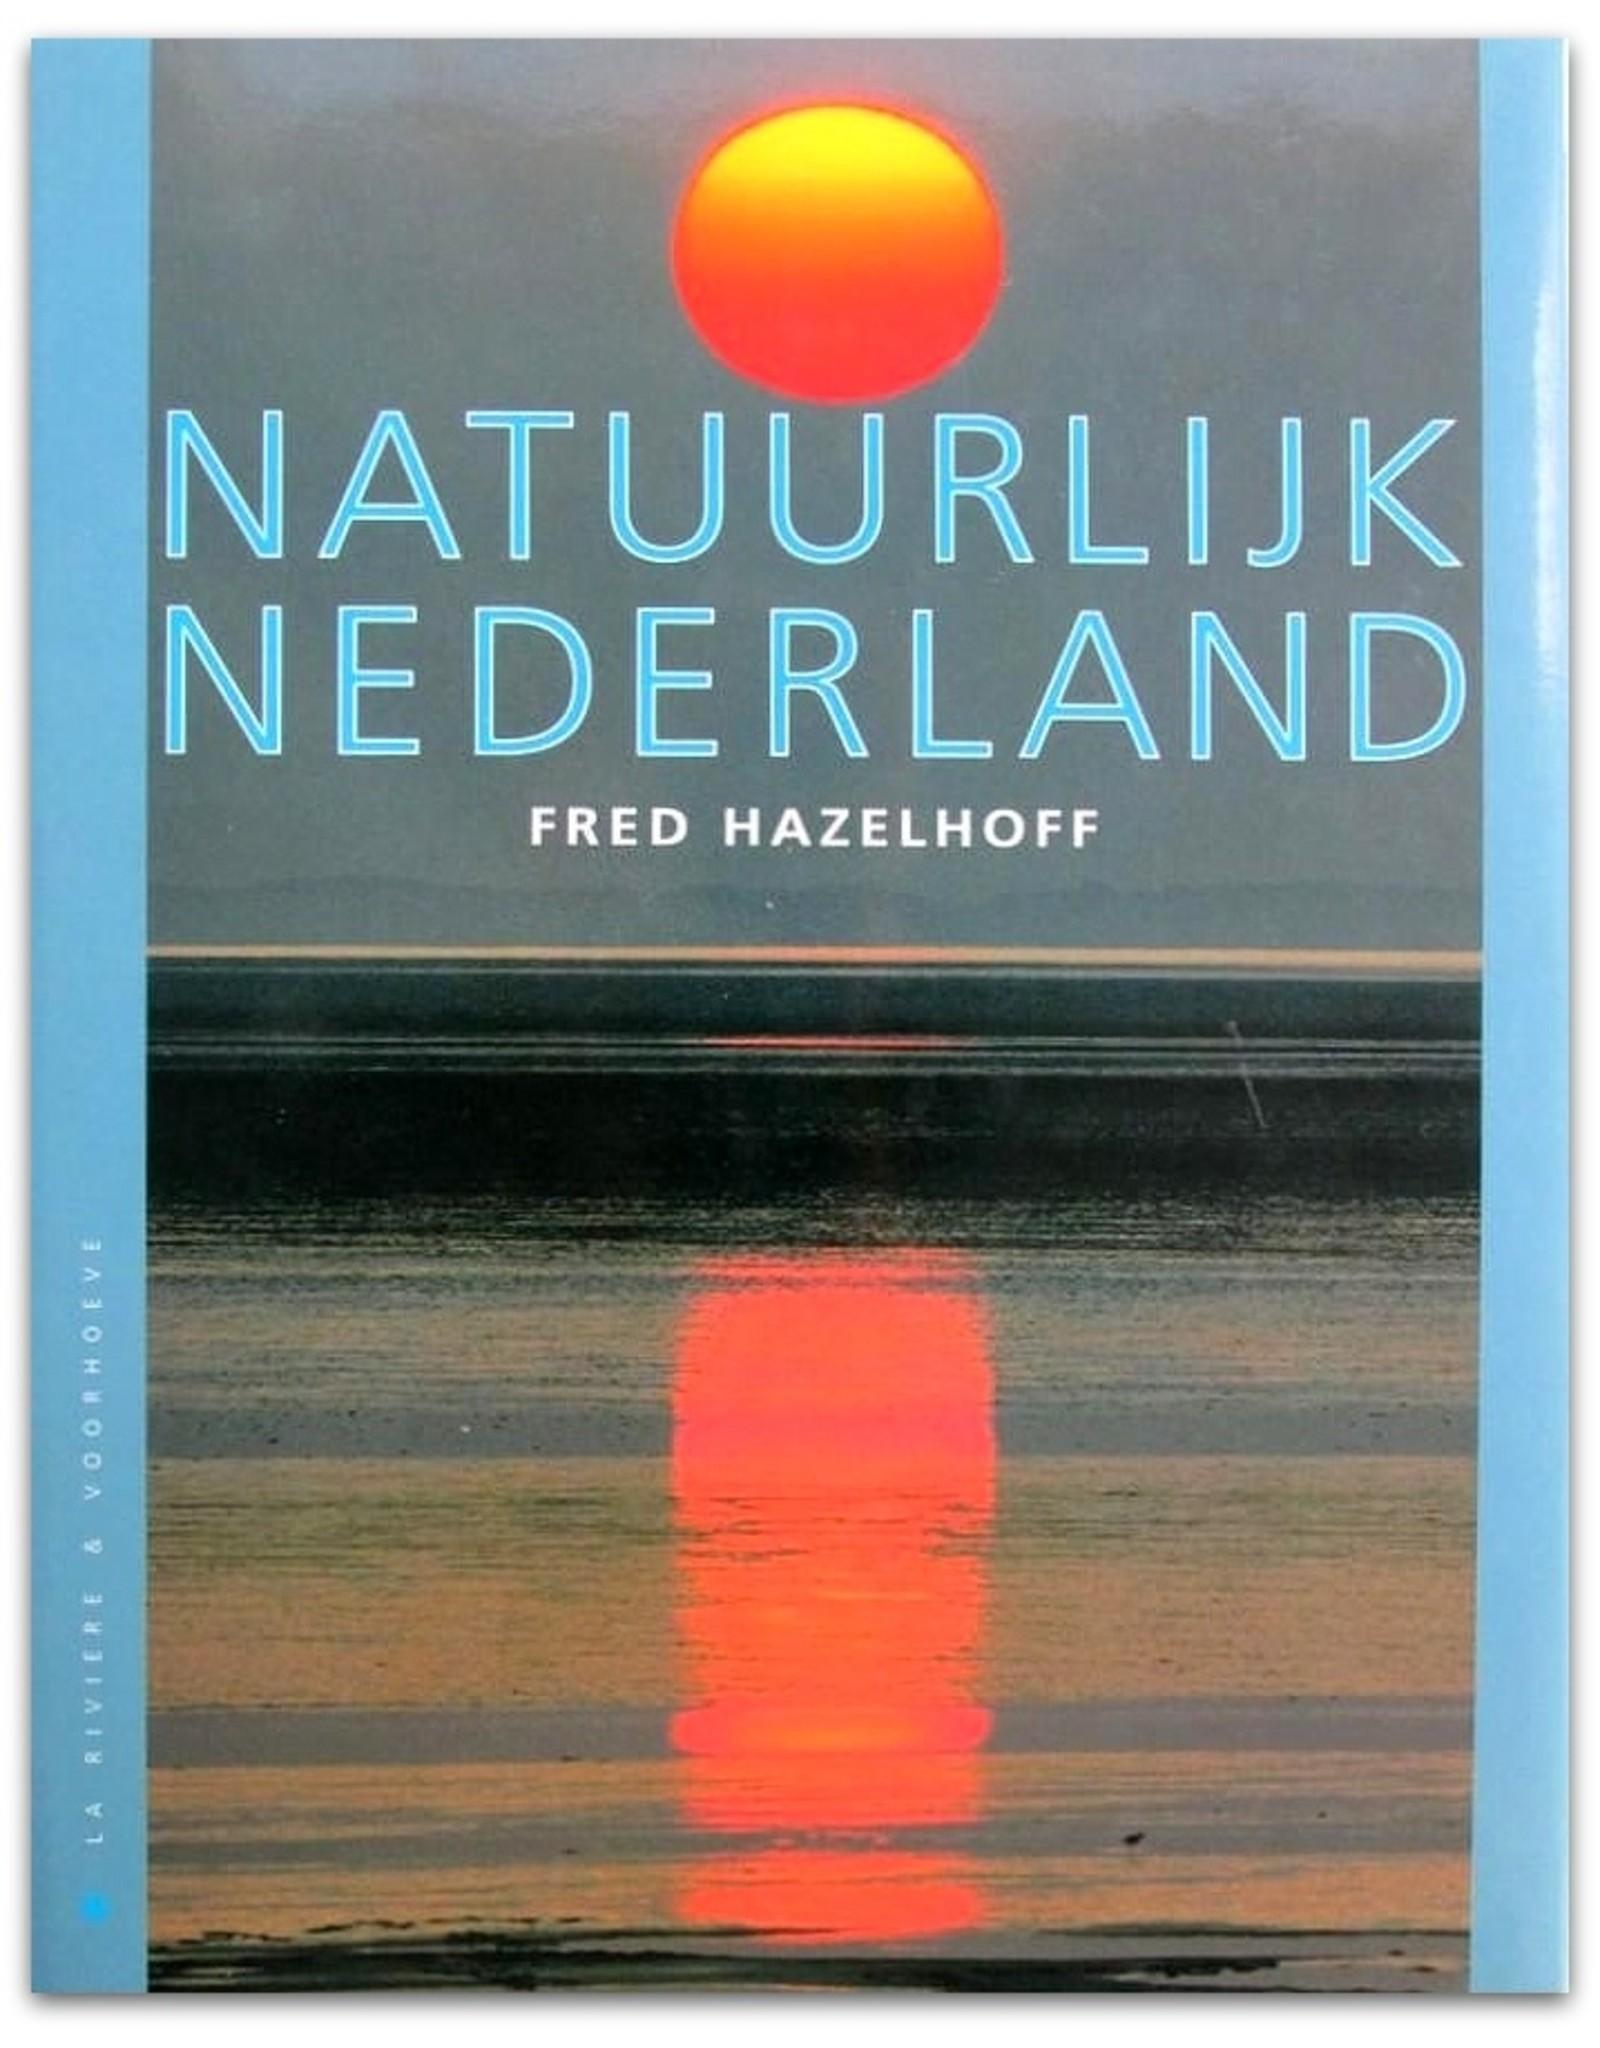 Fred Hazelhoff - Natuurlijk Nederland